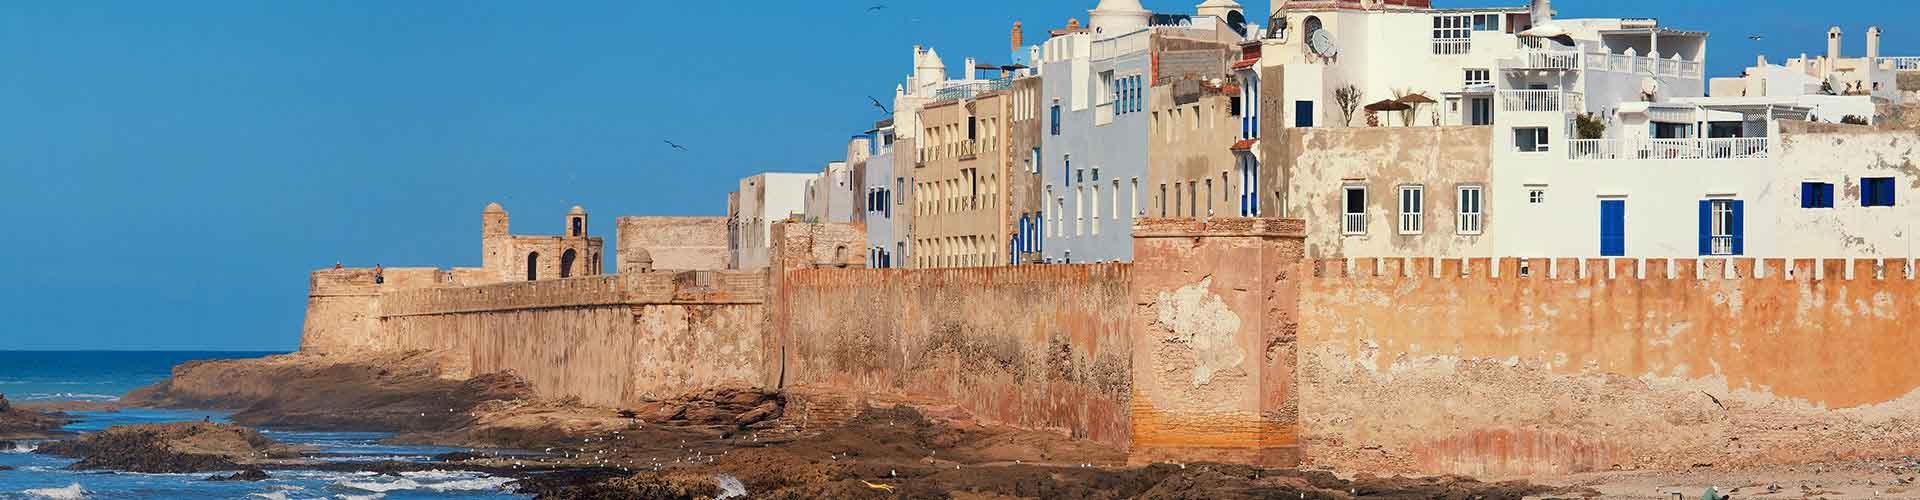 Essaouira - Chambres à Essaouira. Cartes pour Essaouira, photos et commentaires pour chaque chambre à Essaouira.